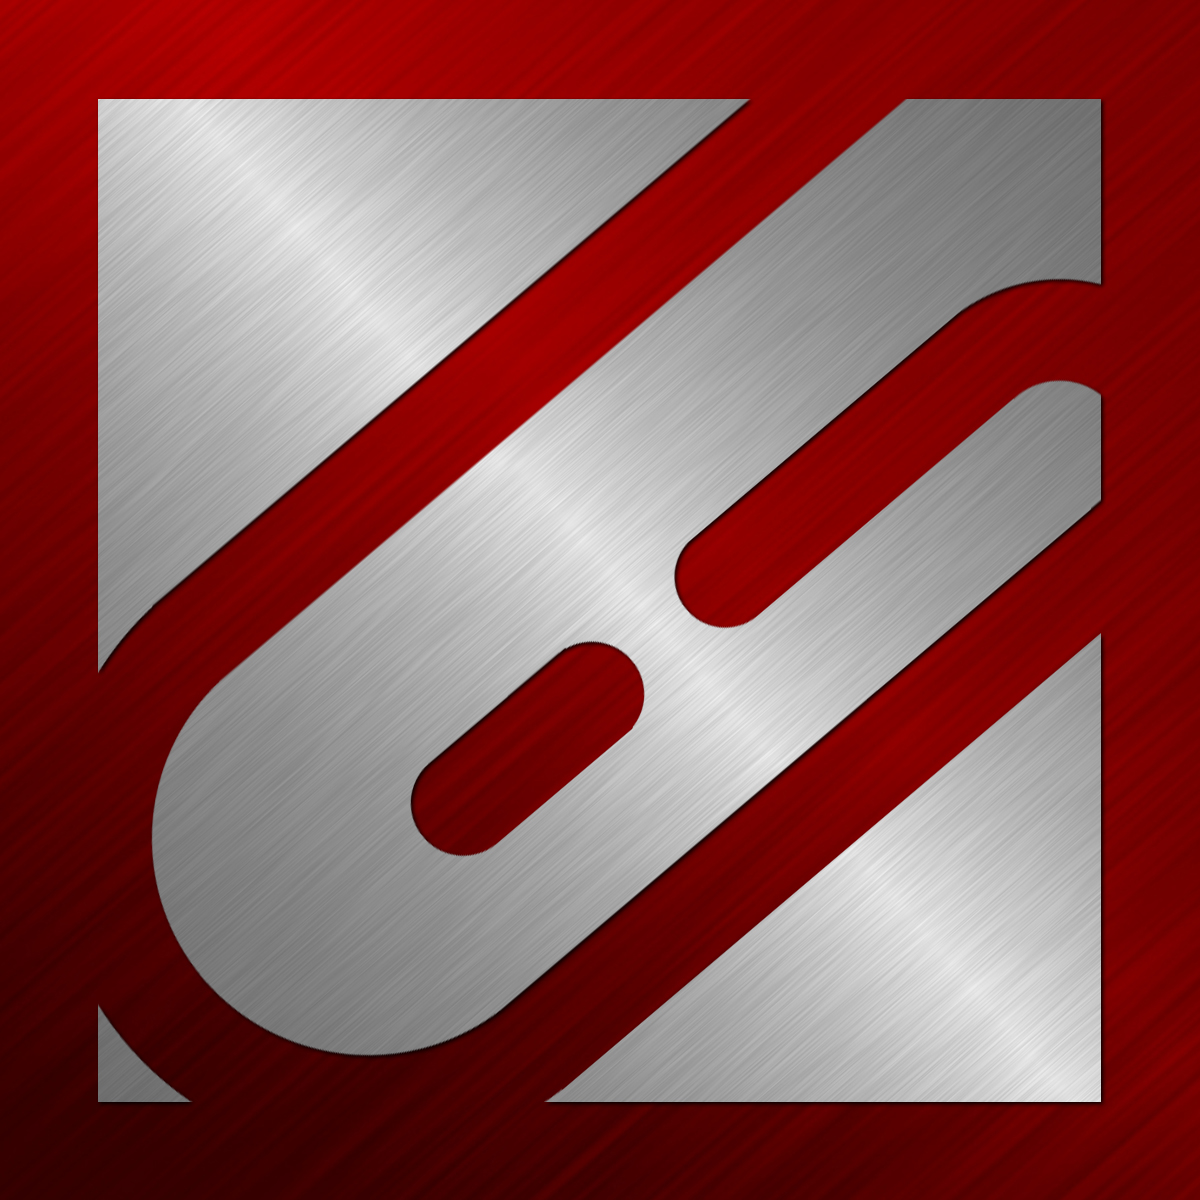 GFRN (G-Force Radio Network)